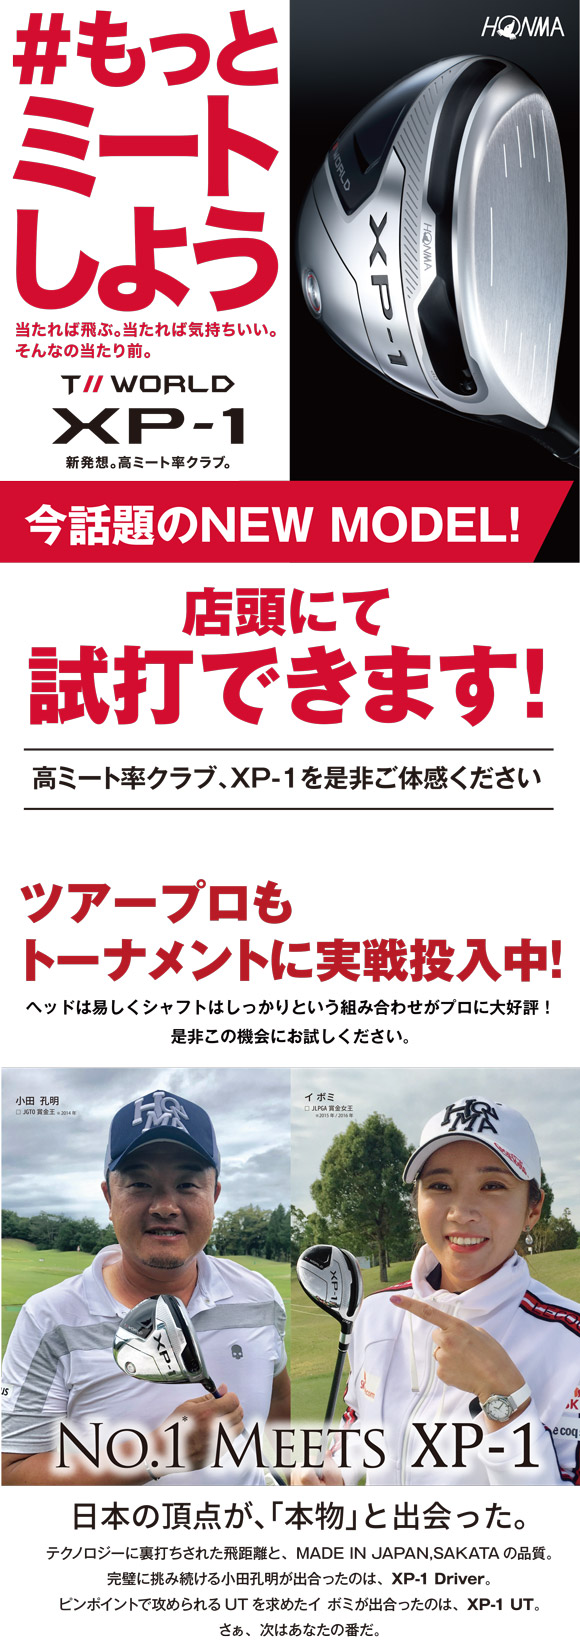 T//WORLD XP-1新製品画像